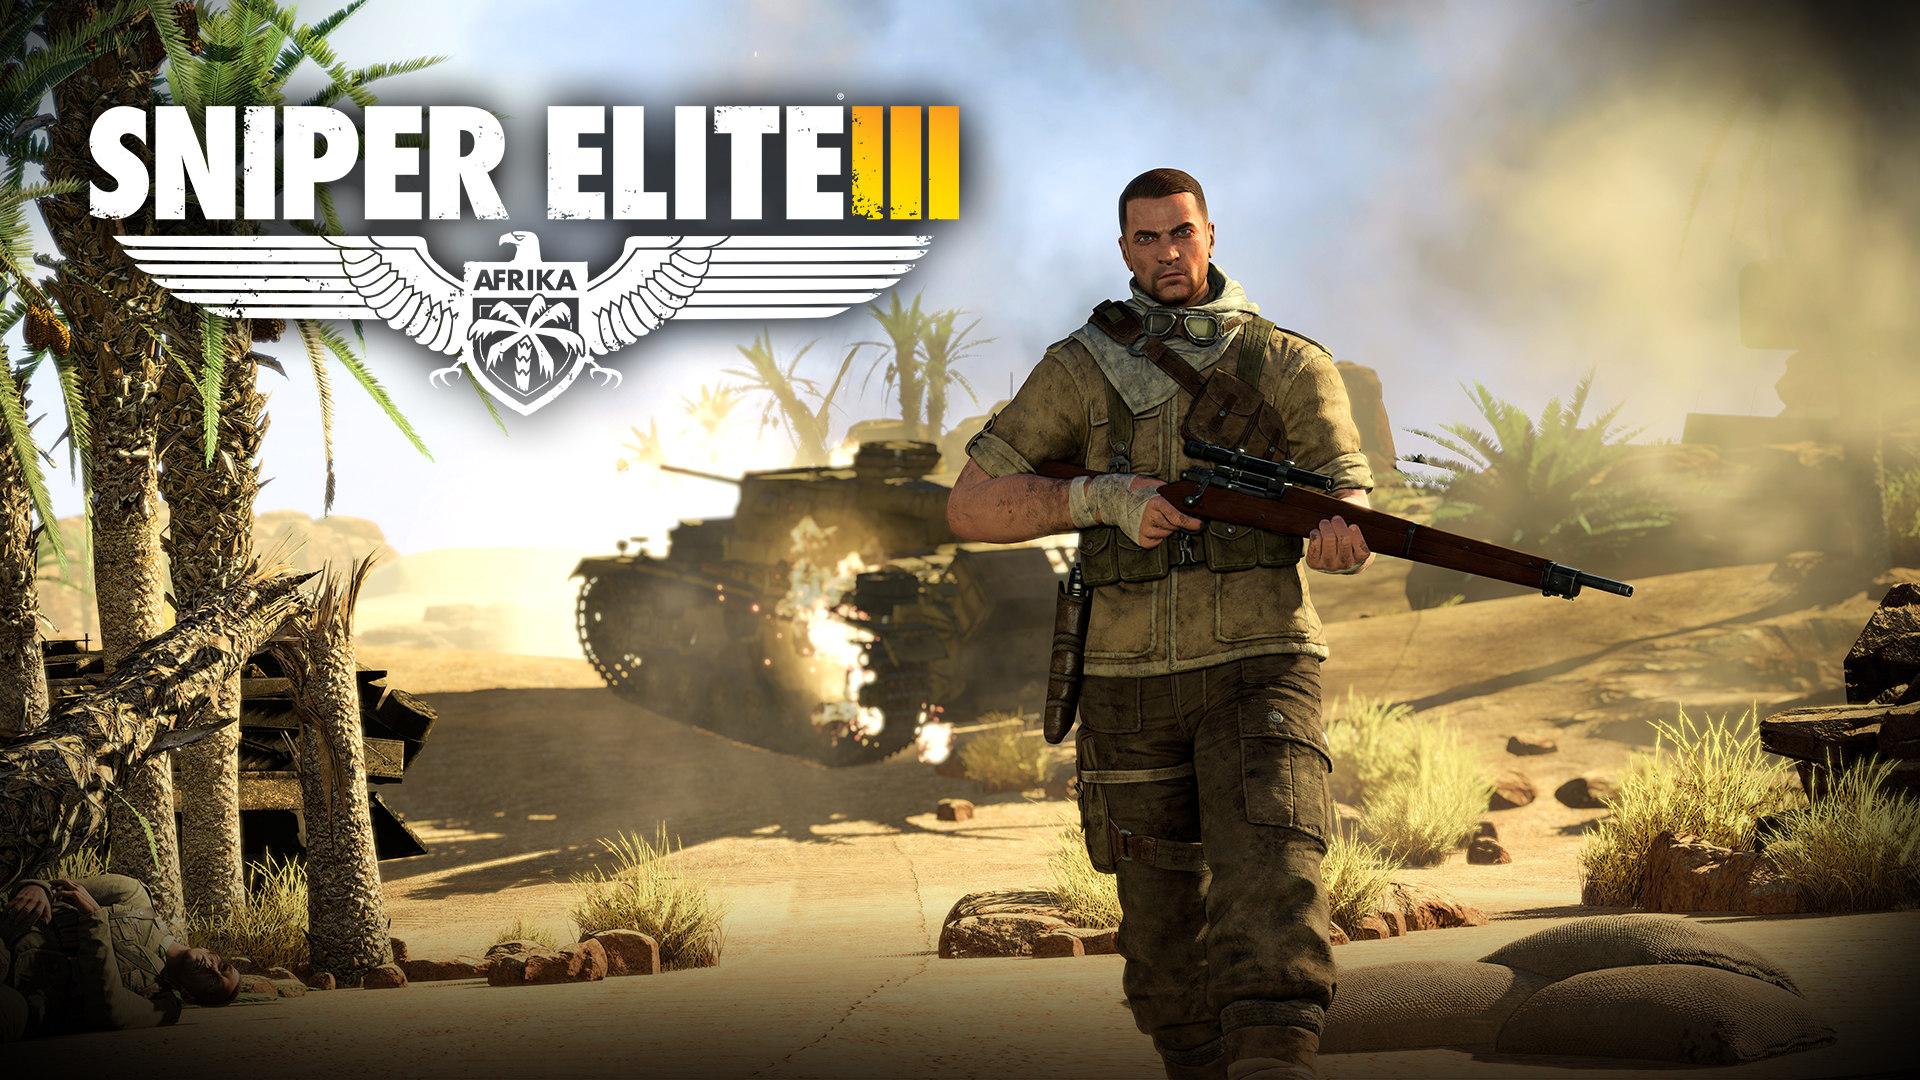 Sniper Elite 3 Wallpapers 1080p HA9IR15   4USkY 1920x1080